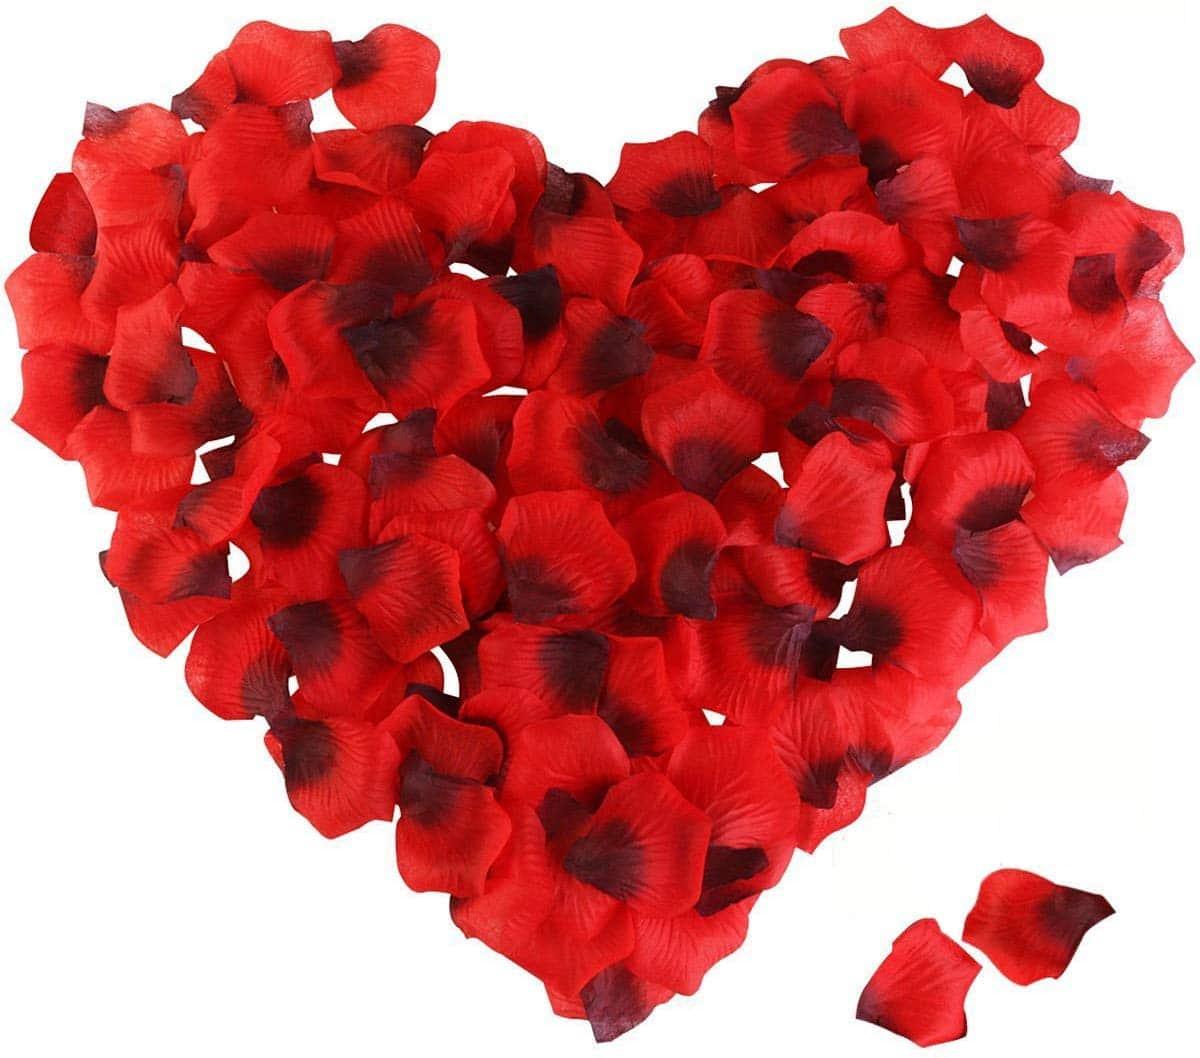 petalos de rosa - decoracion san valentin bodas eventos fiestas